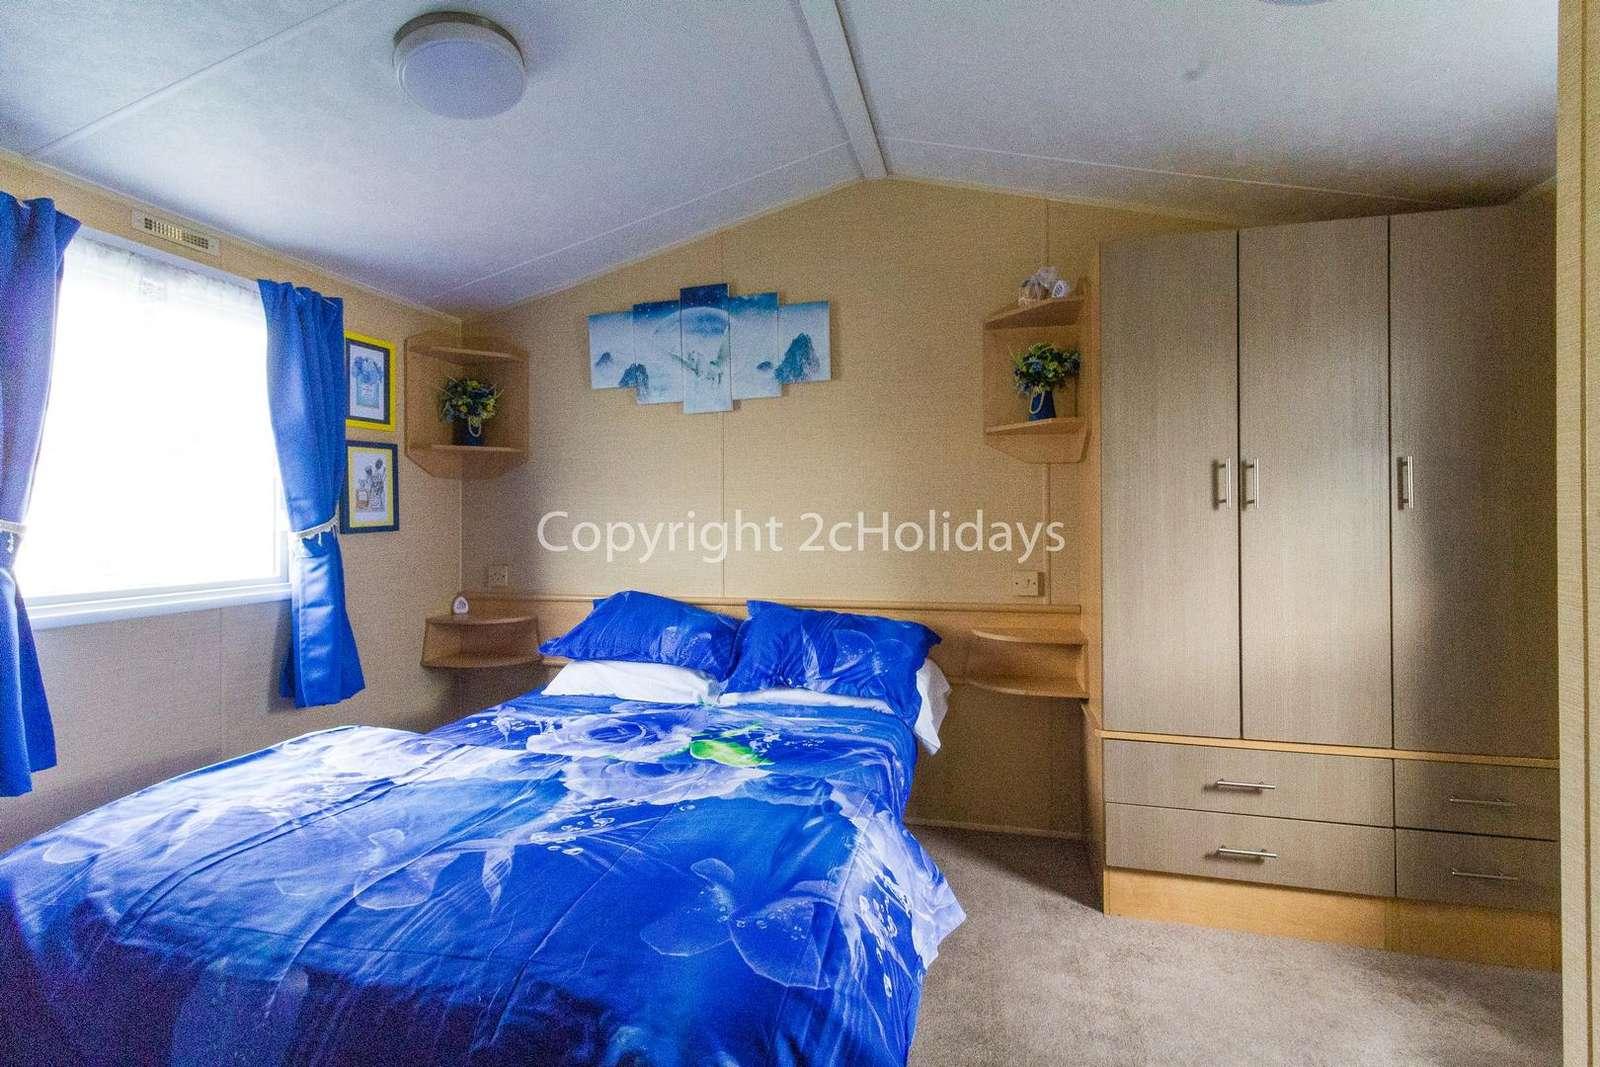 Spacious master bedroom with plenty of storage space